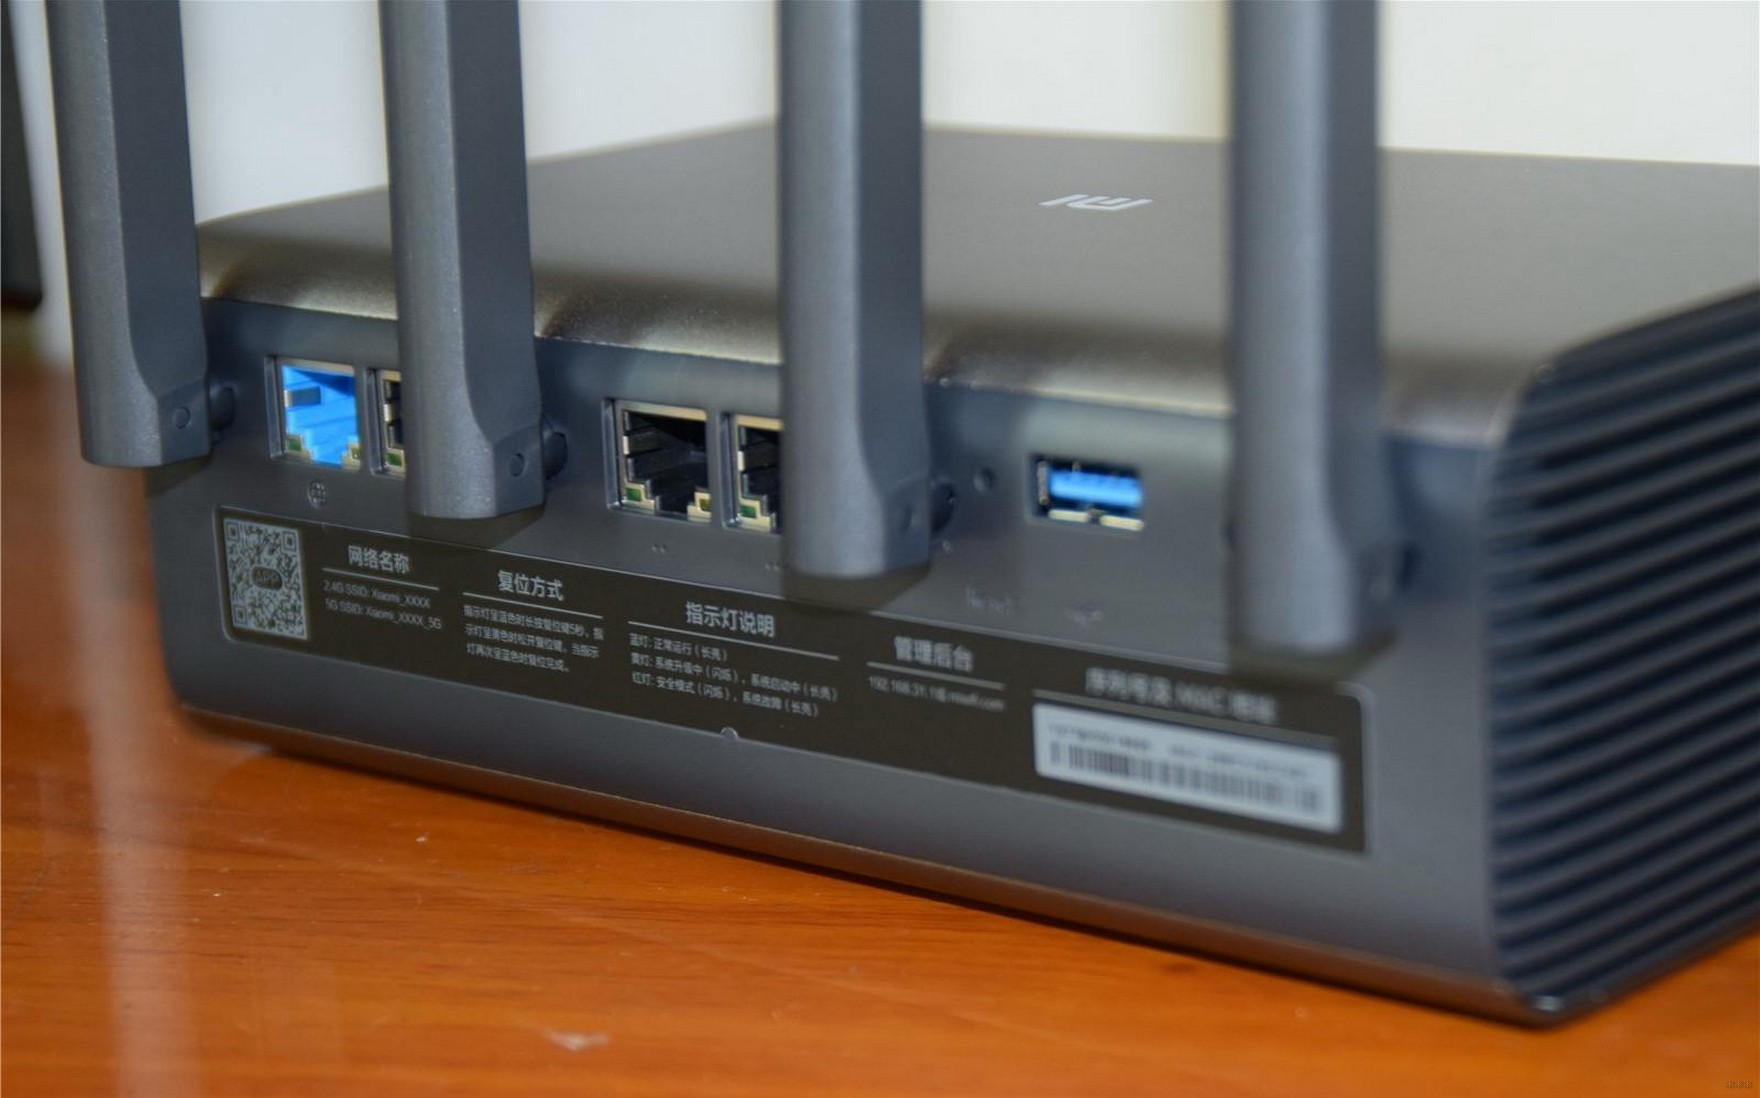 Двухдиапазонный гигабитный роутер Xiaomi Mi Wi-Fi Router Pro